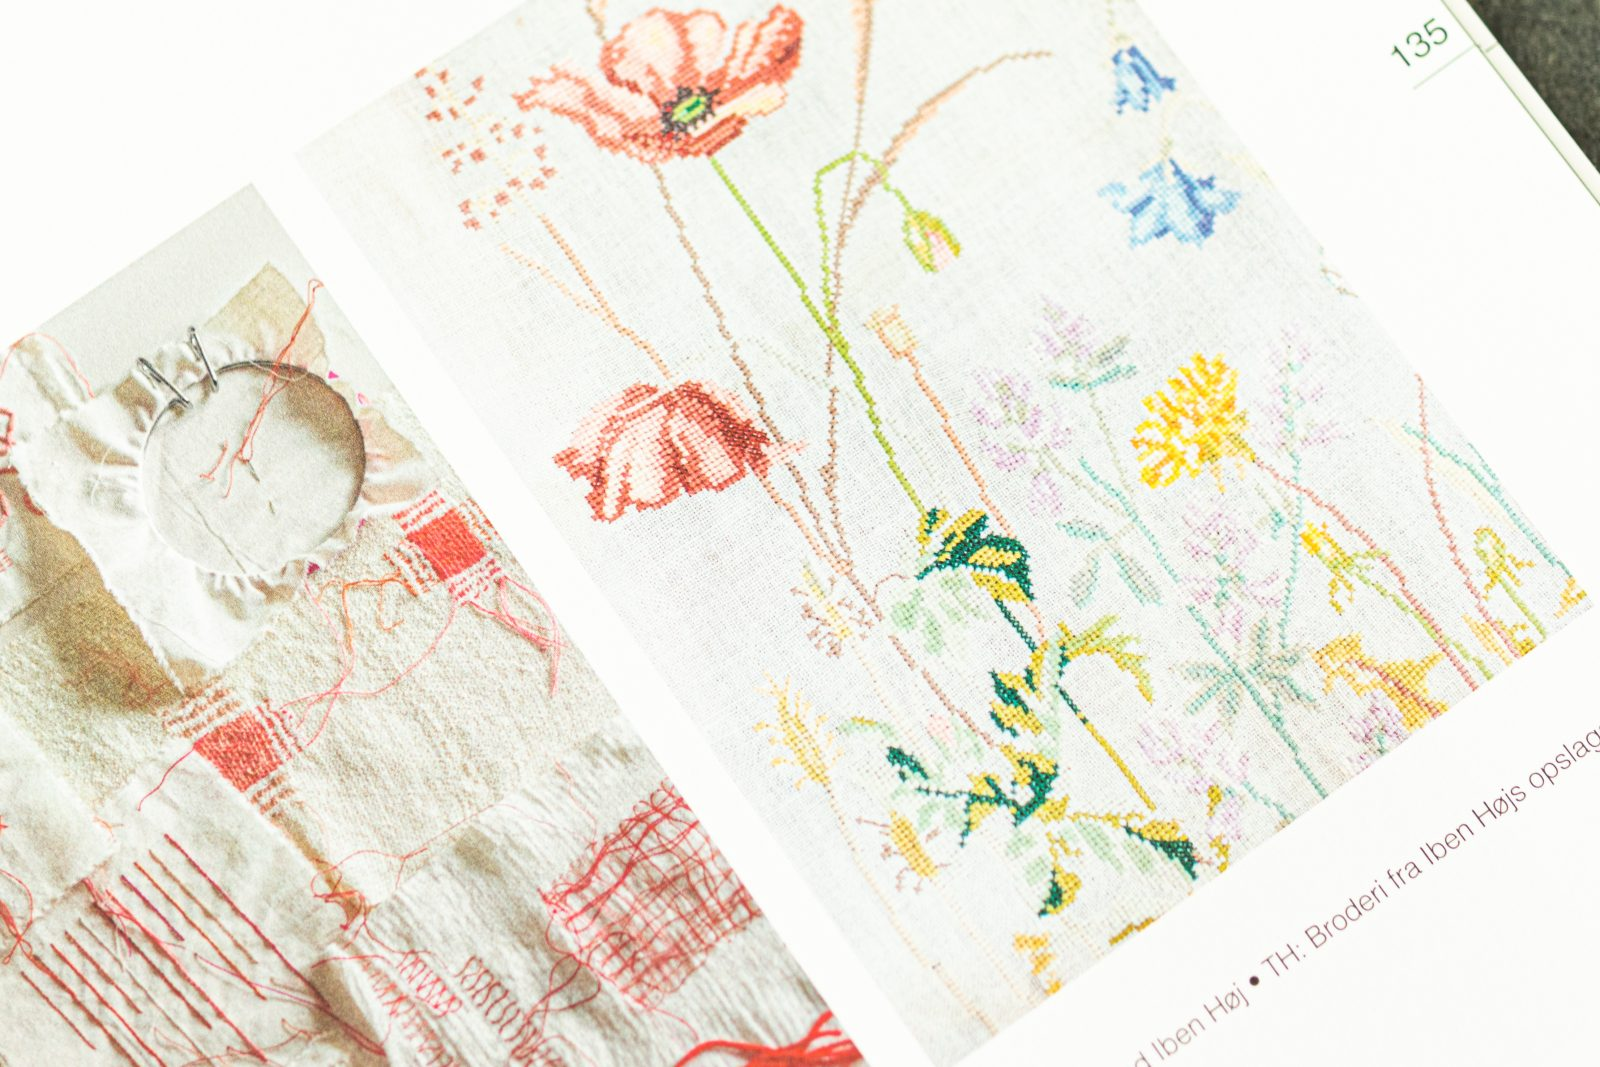 Håndværk, Bookazine, Tekstil, Rigetta Klint